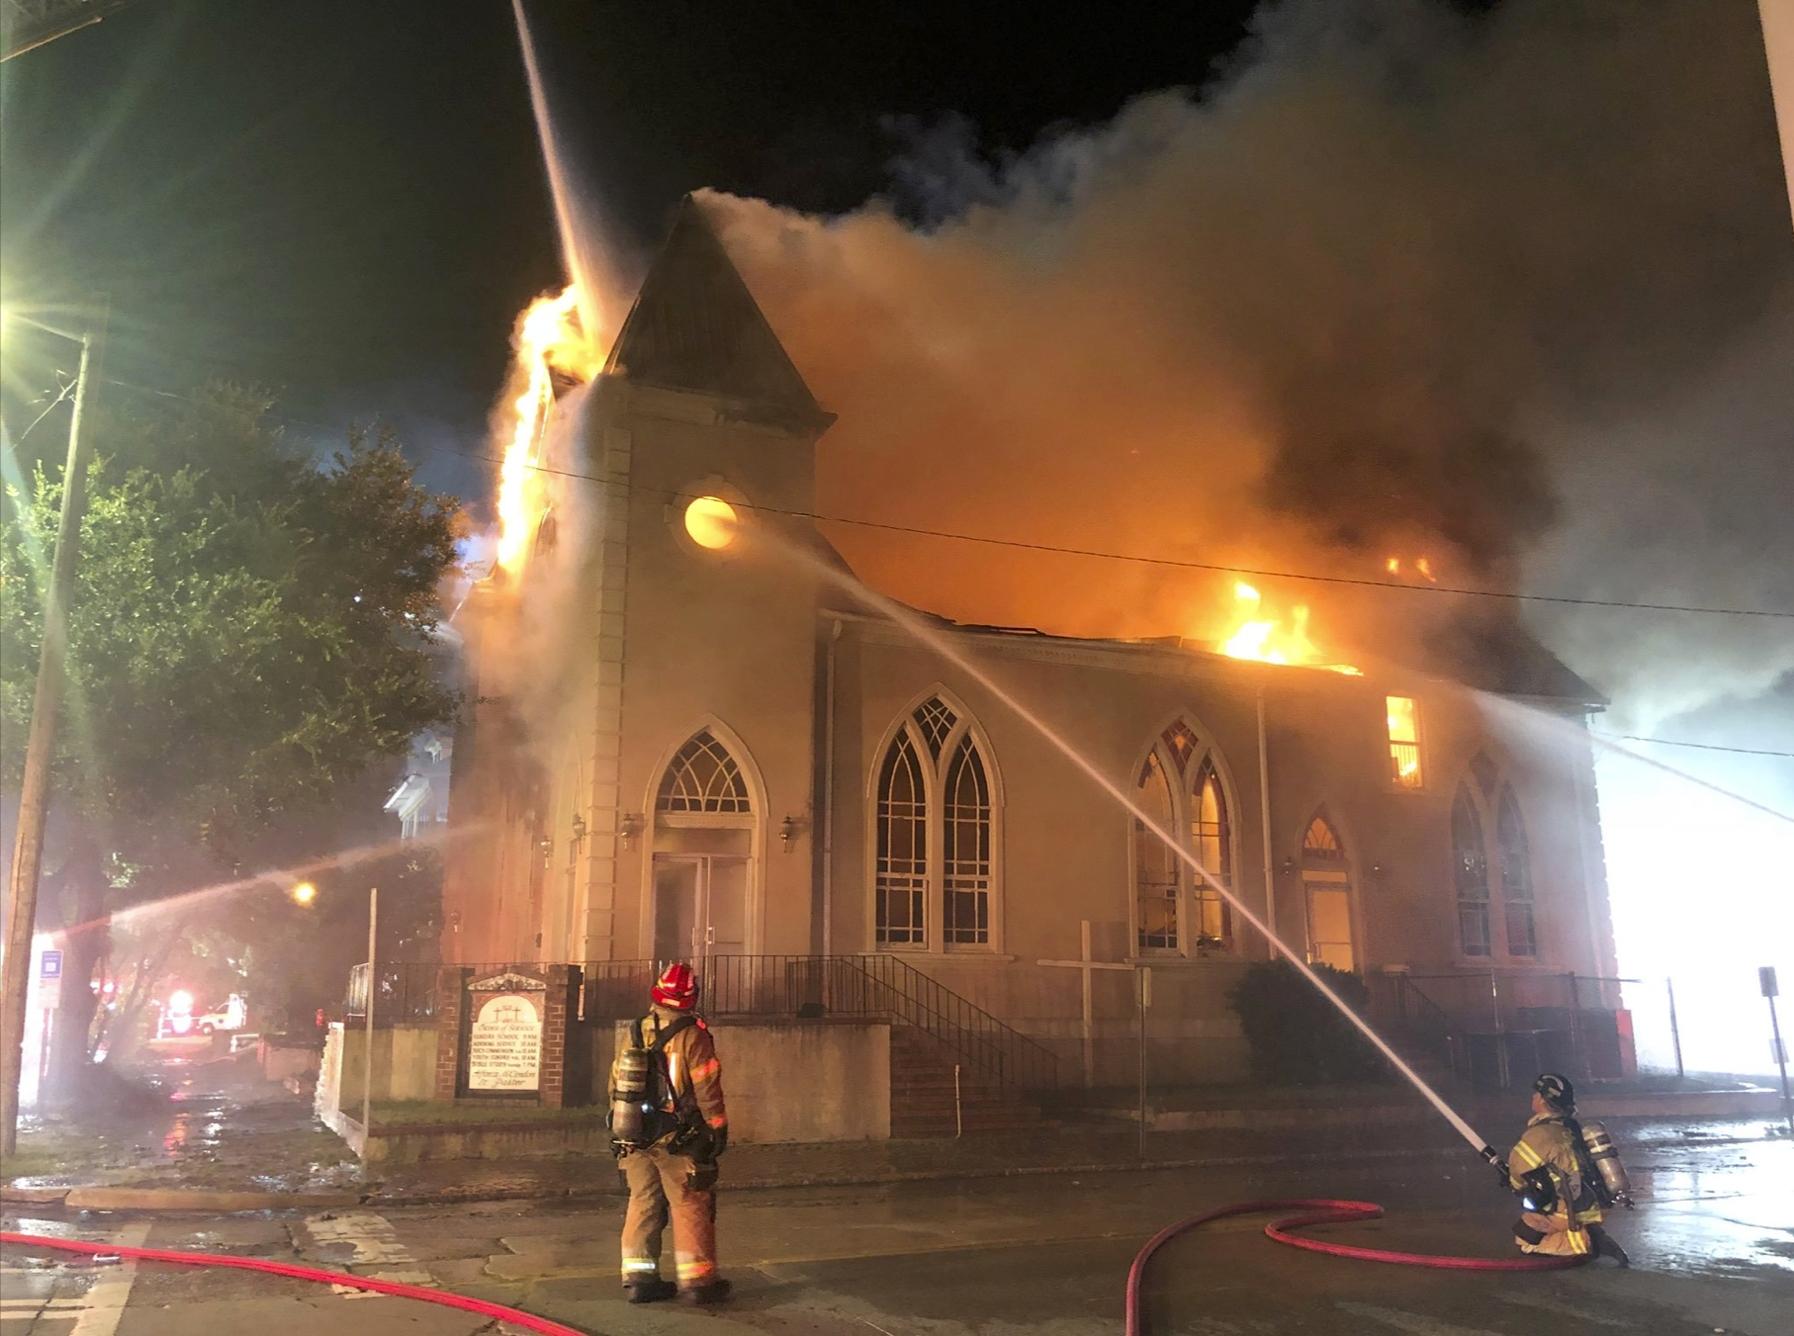 House fire devours Baptist church in Savannah, Georgia | WTOP